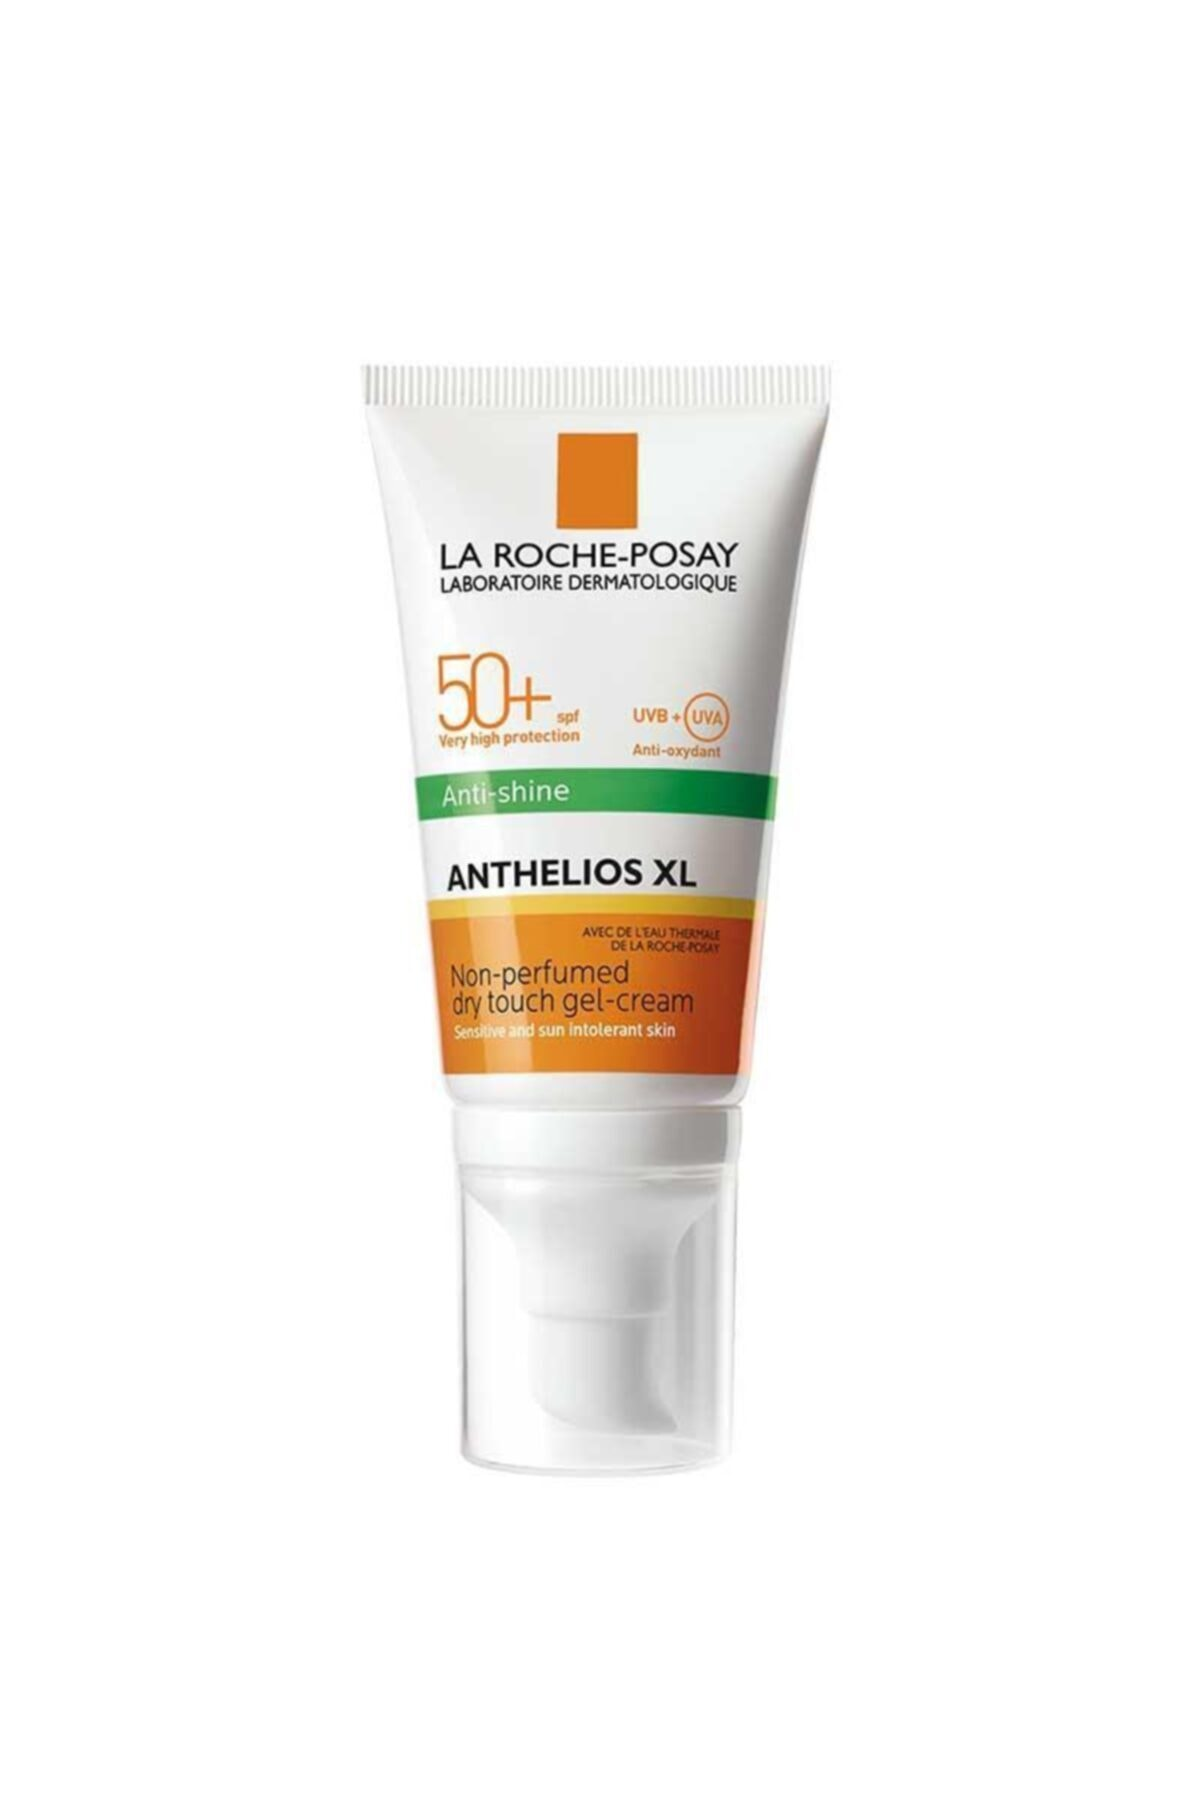 La Roche Posay Anthelios Xl Spf 50+ Gel Cream 1